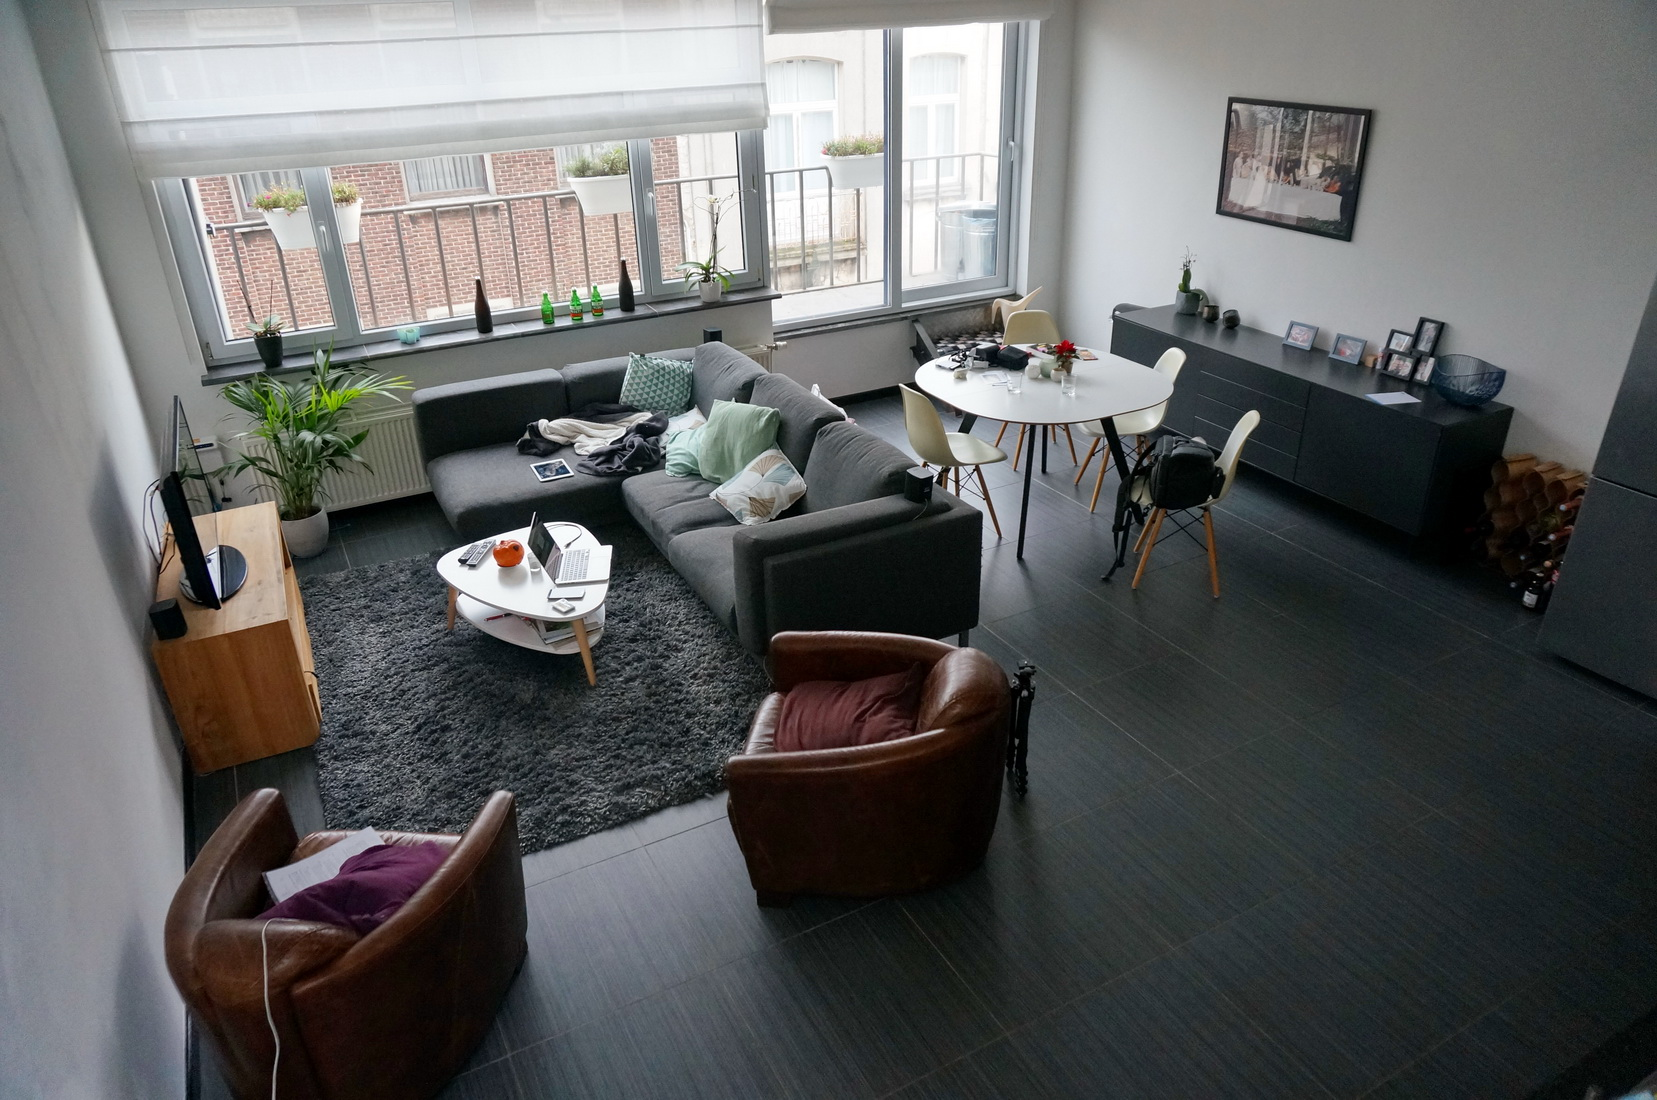 appartement airbnb anvers, antwerp, appartement à louer, antwerpen